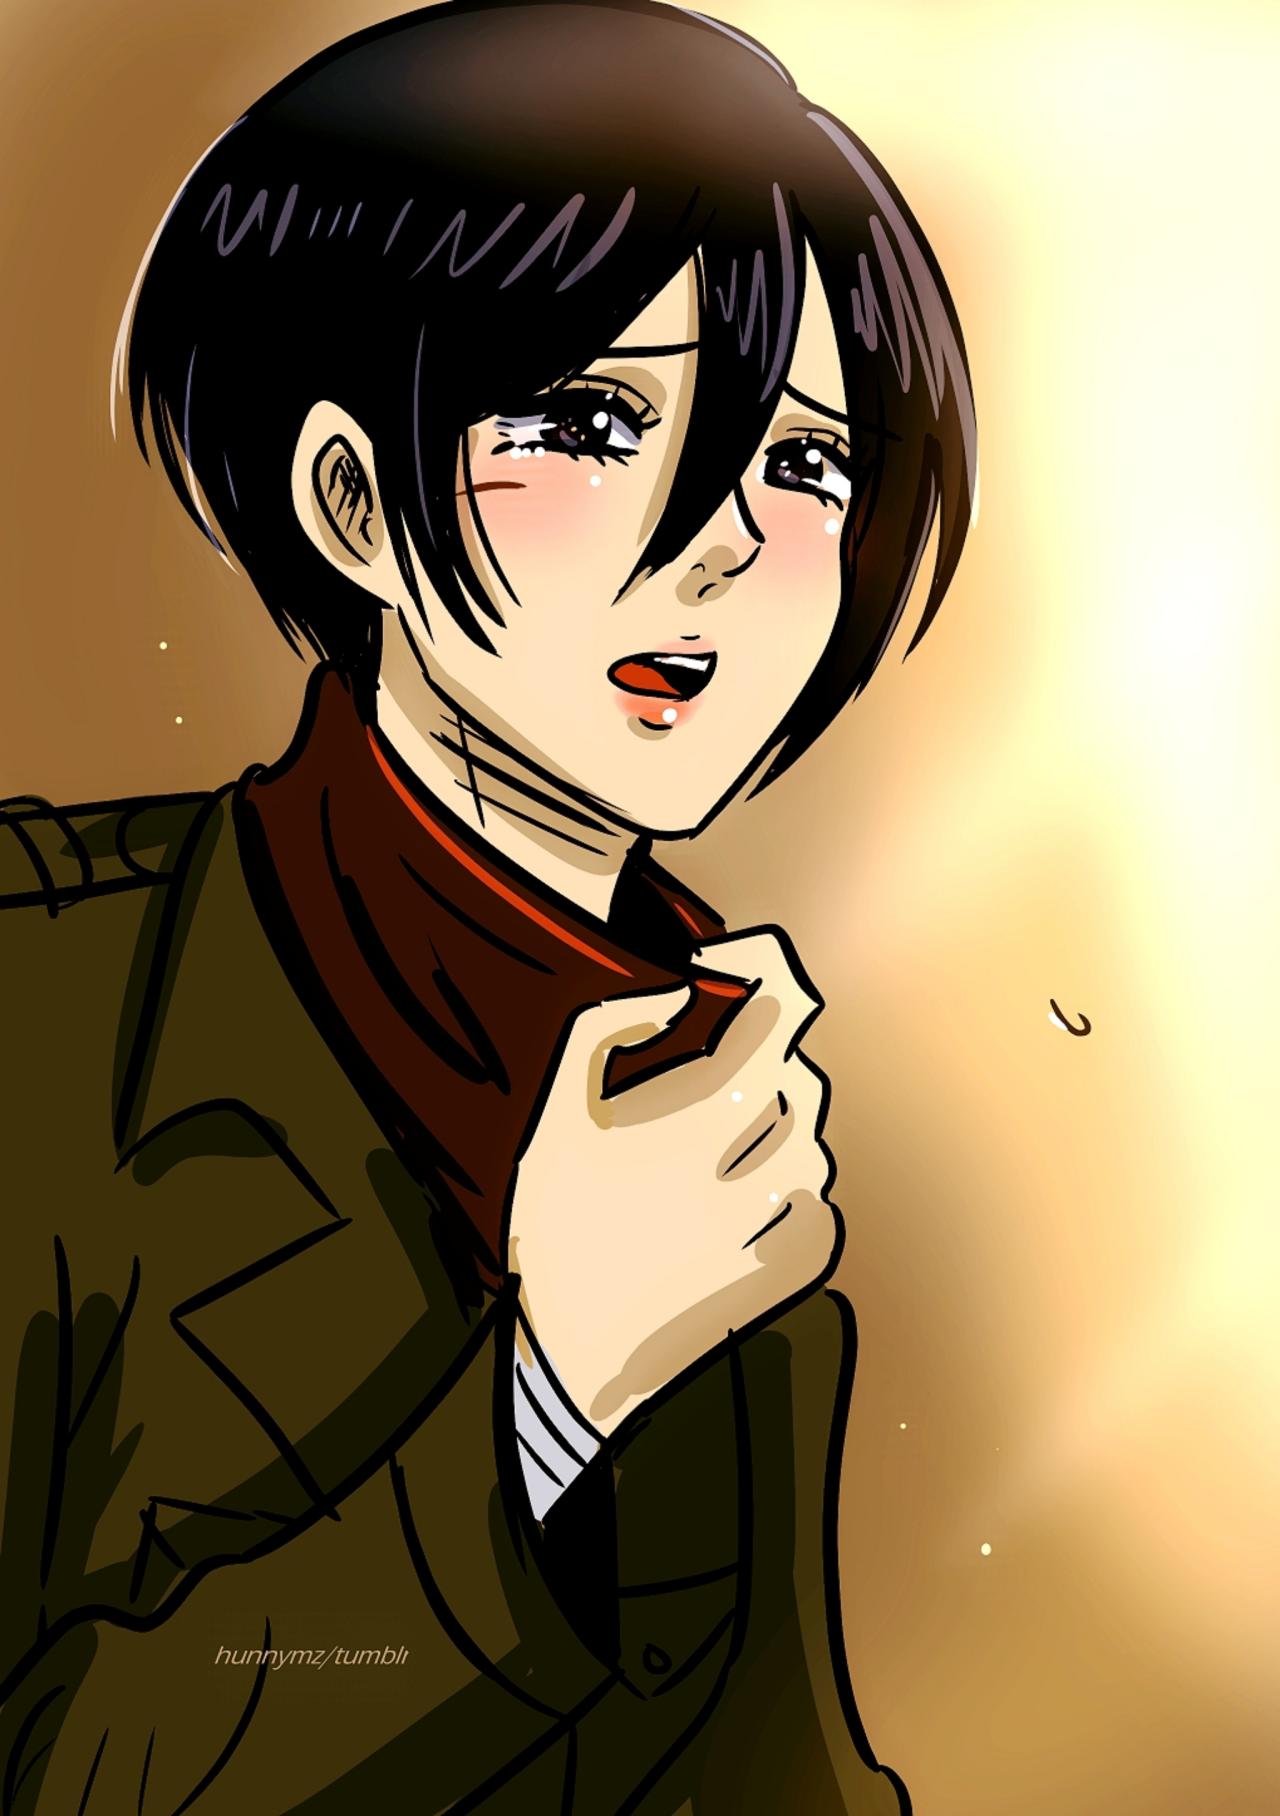 Pin By Katherine Elizabeth On Mikasa Ackerman Attack On Titan Anime Attack On Titan Art Attack On Titan Fanart